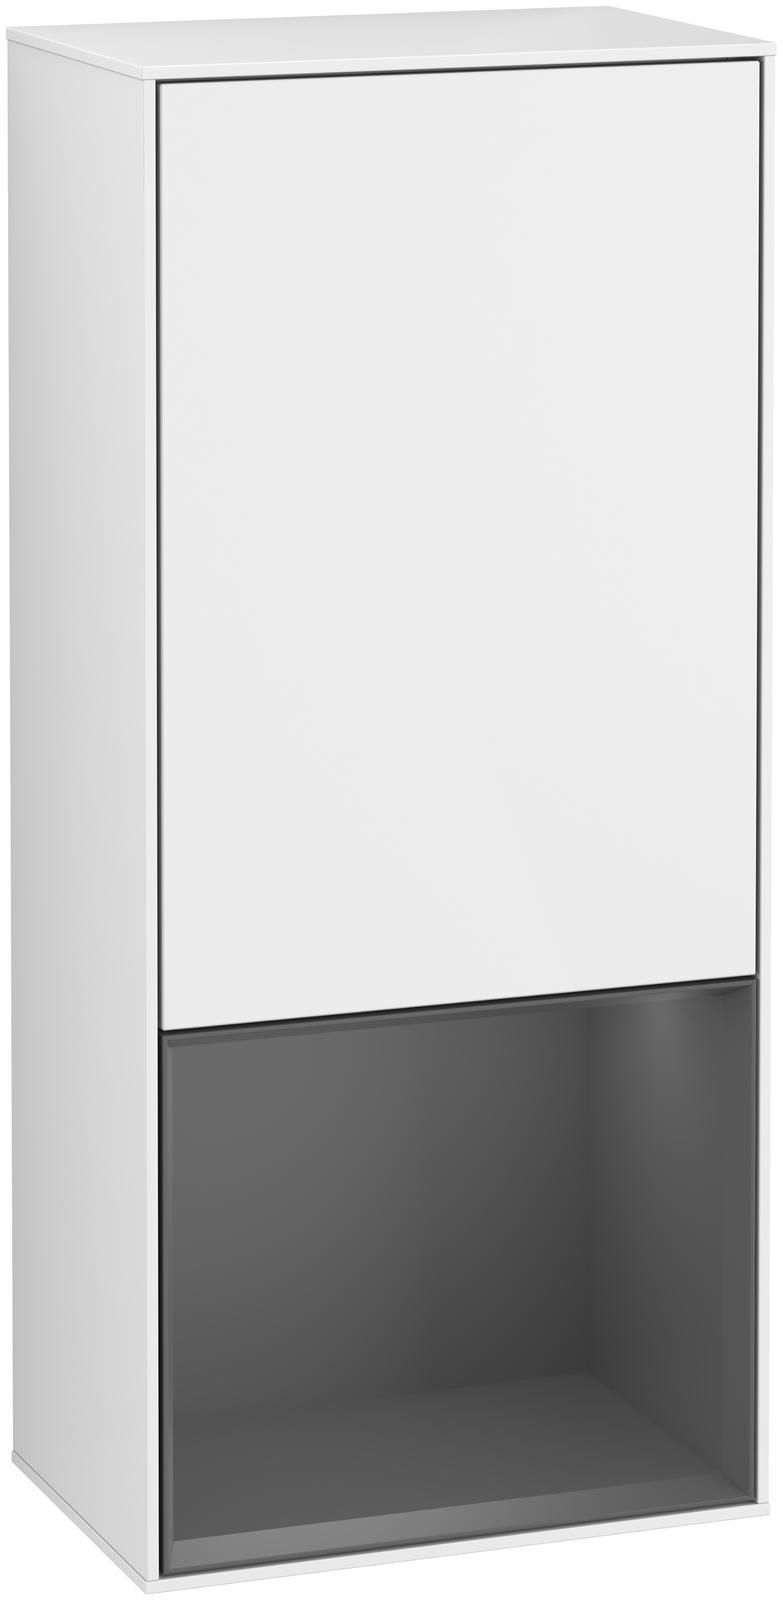 Villeroy & Boch Finion F54 Seitenschrank mit Regalelement 1 Tür Anschlag links LED-Beleuchtung B:41,8xH:93,6xT:27cm Front, Korpus: Glossy White Lack, Regal: Anthracite Matt F540GKGF